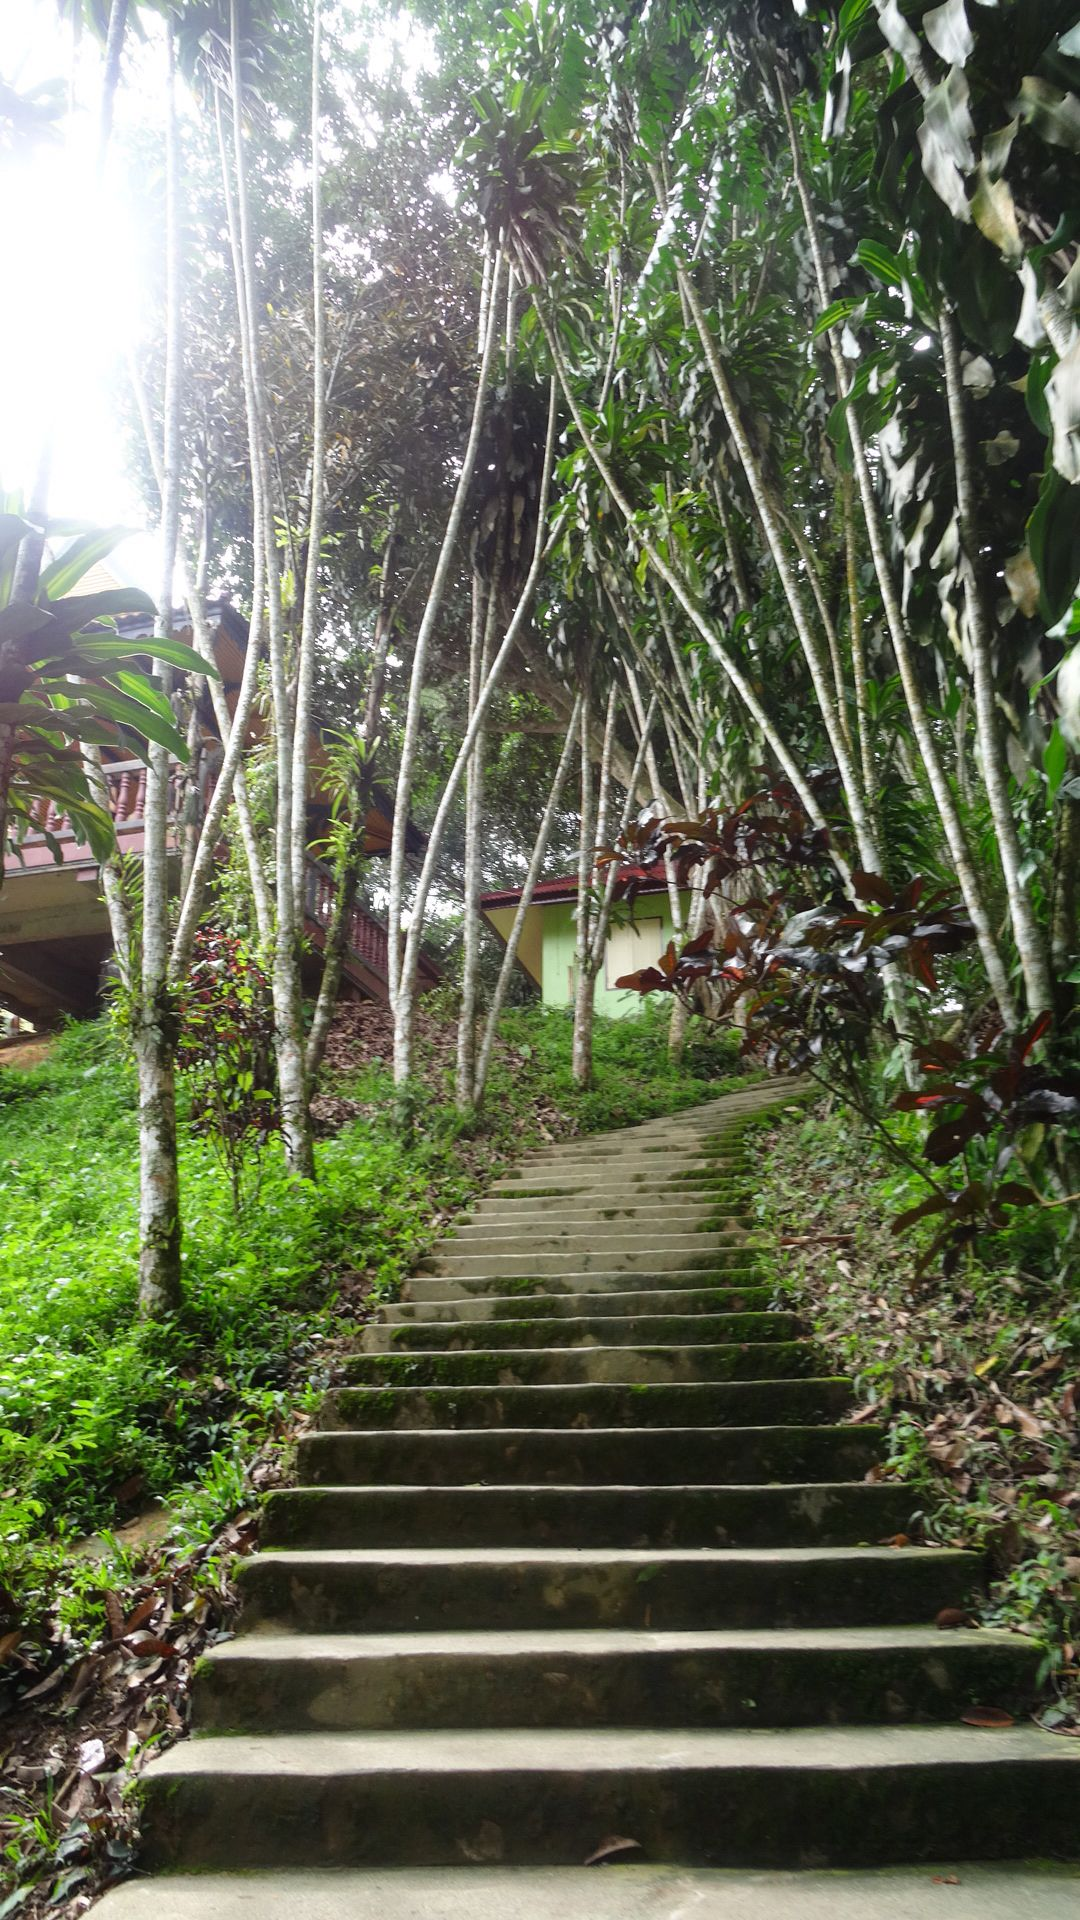 Stairs from magic garden #thailand #kohsamui